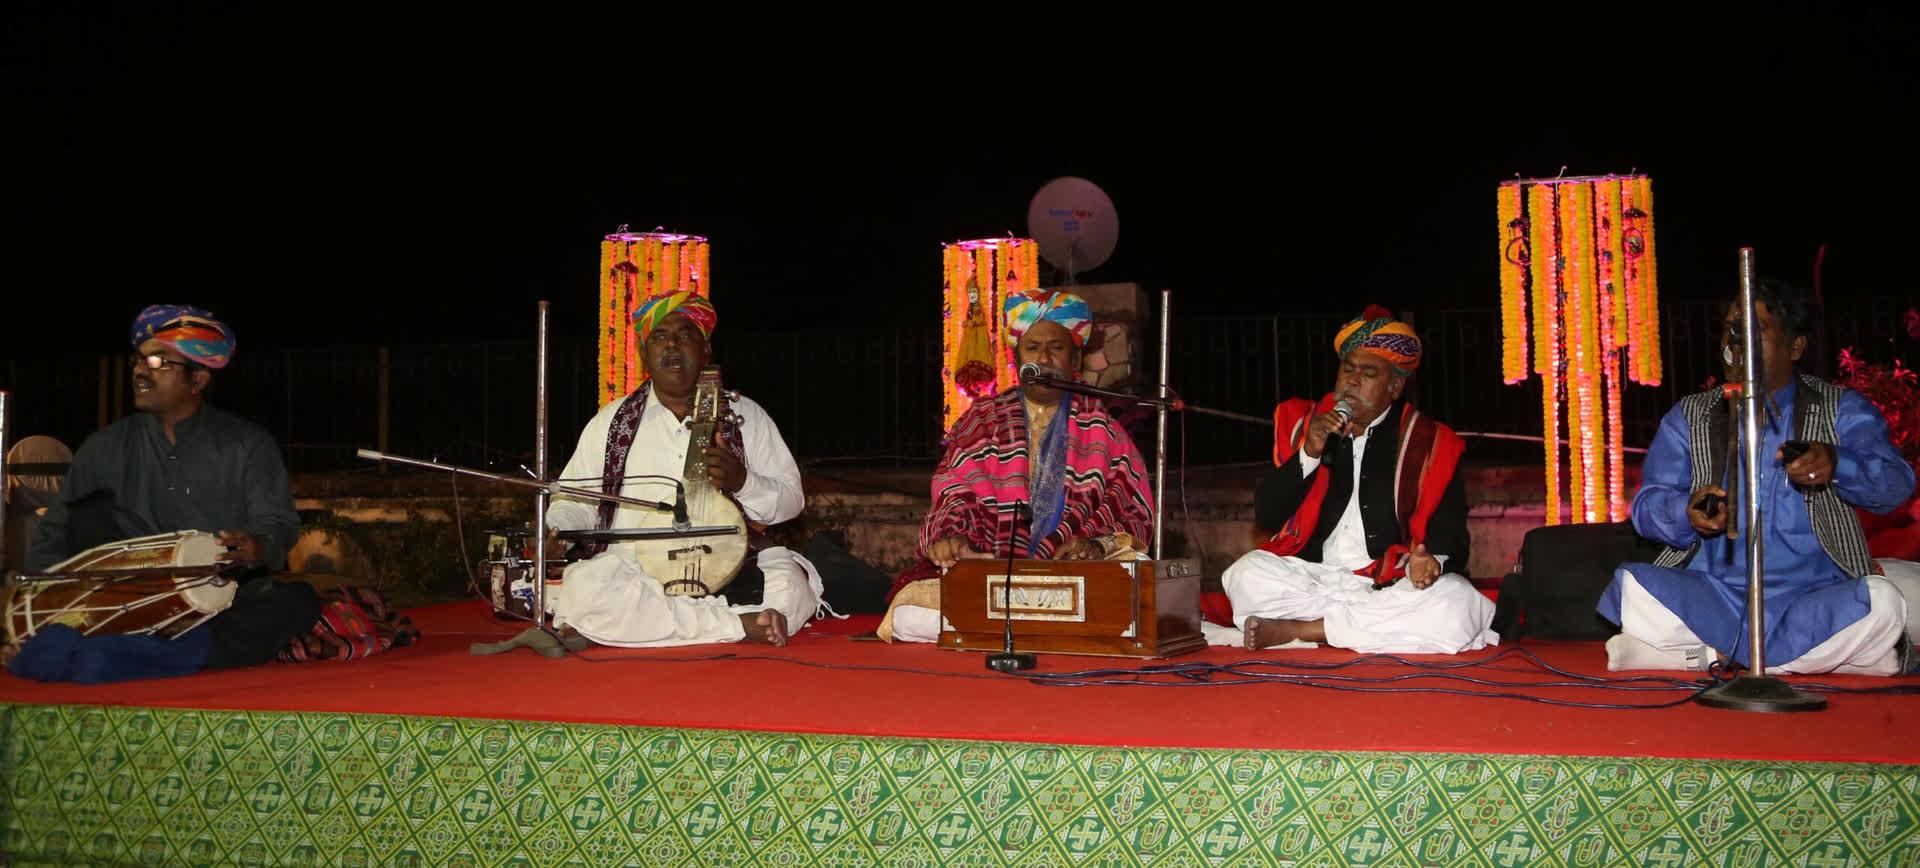 A private concert hosted by the author. L-R Firoz Khan on dholak, Ghewar Khan on kamaicha, Anwar Khan and Barkat Khan on vocals and Gazi Khan on Khartaal